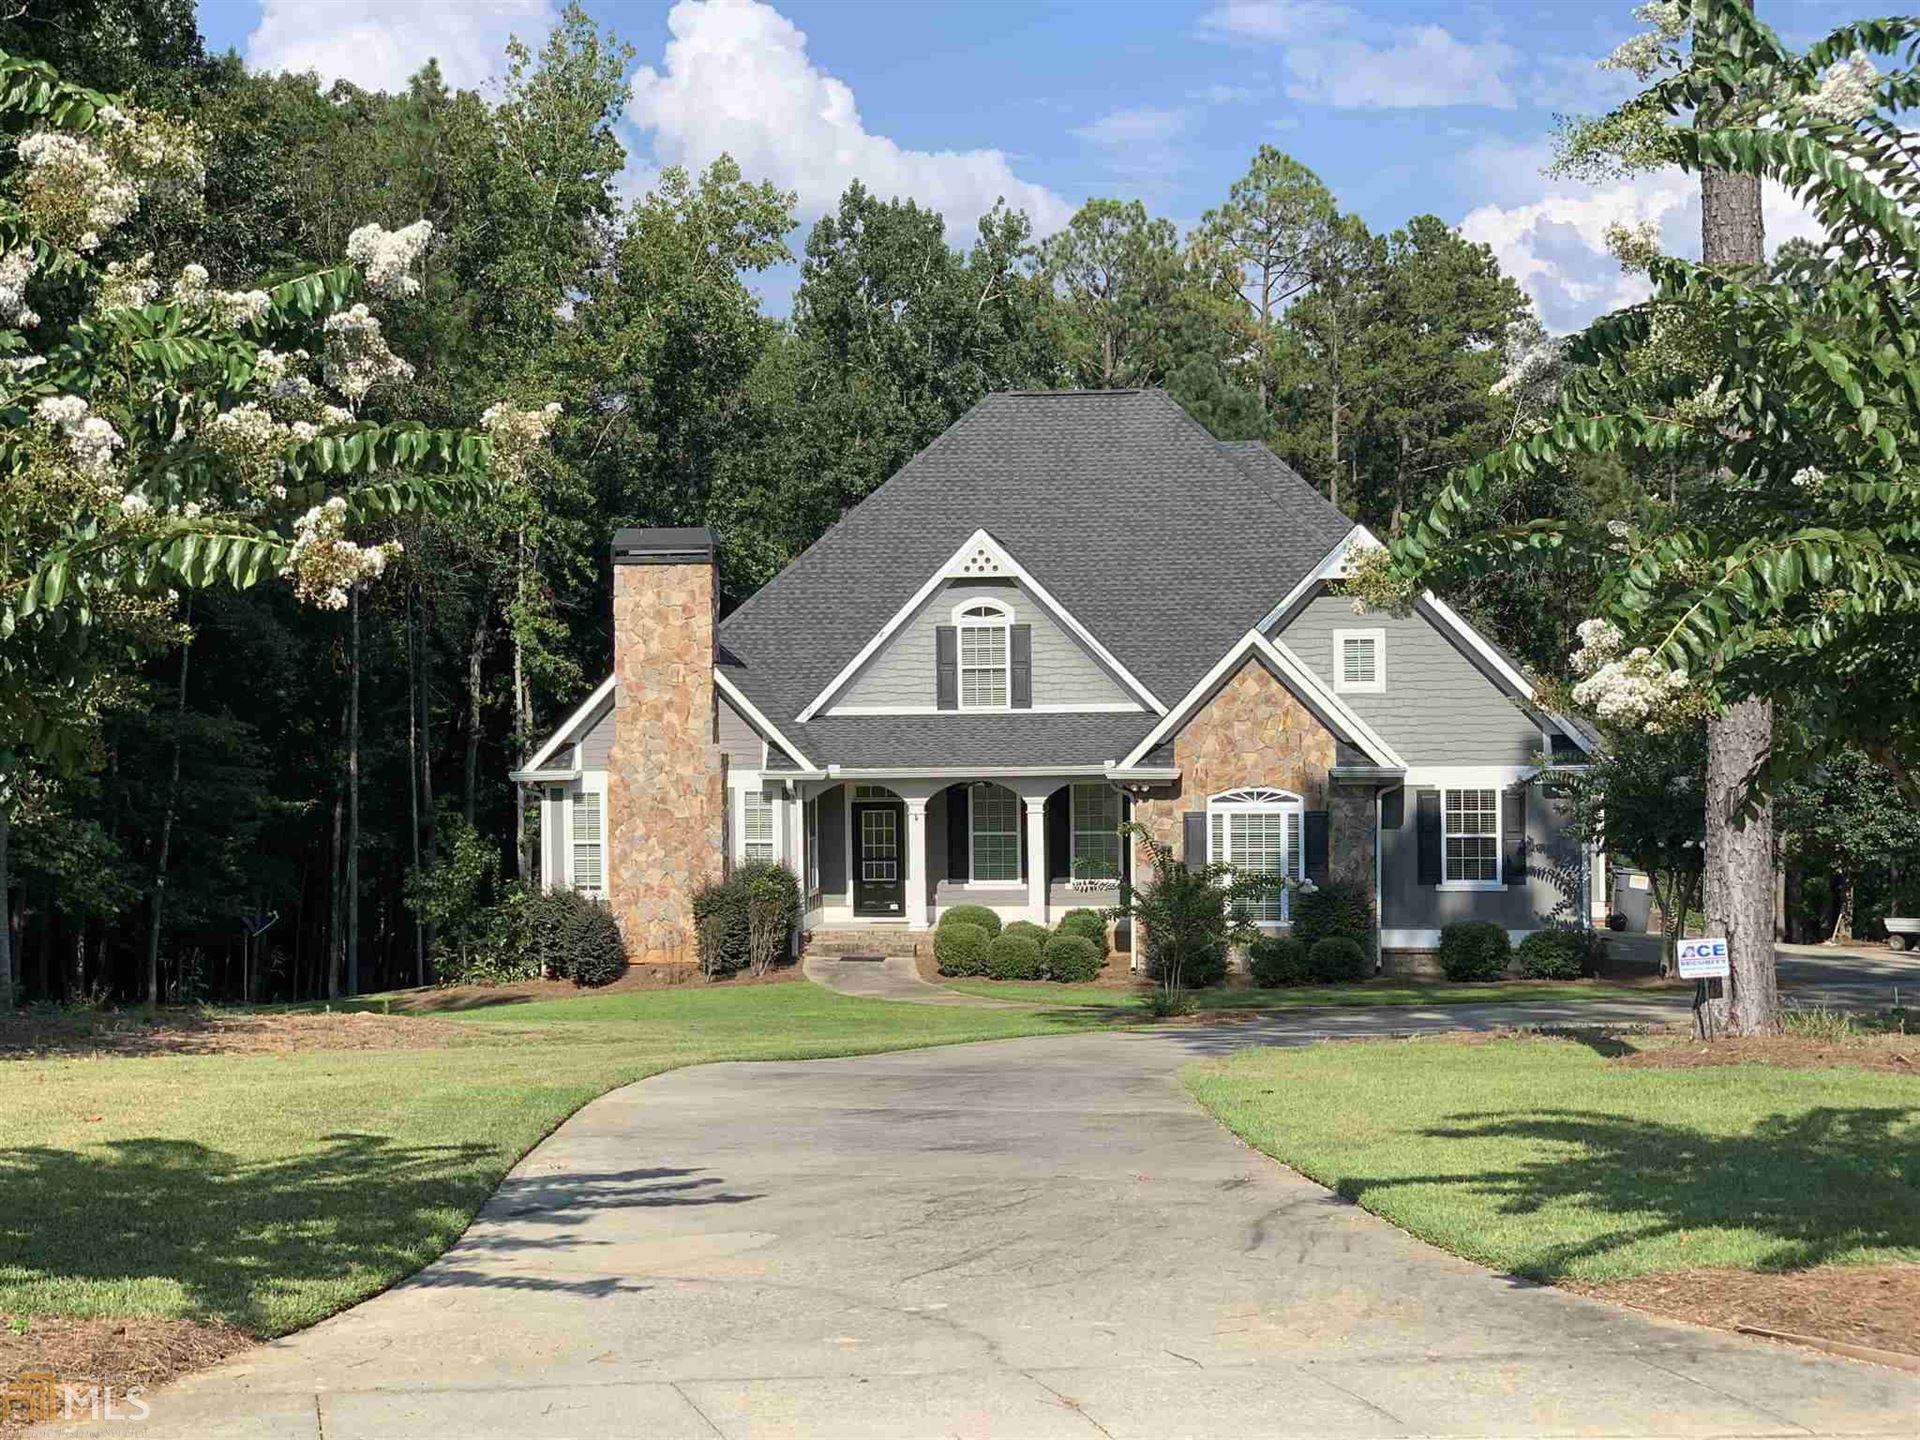 300 Pebble Hollow Dr, Milledgeville, GA 31061 - MLS#: 8840446